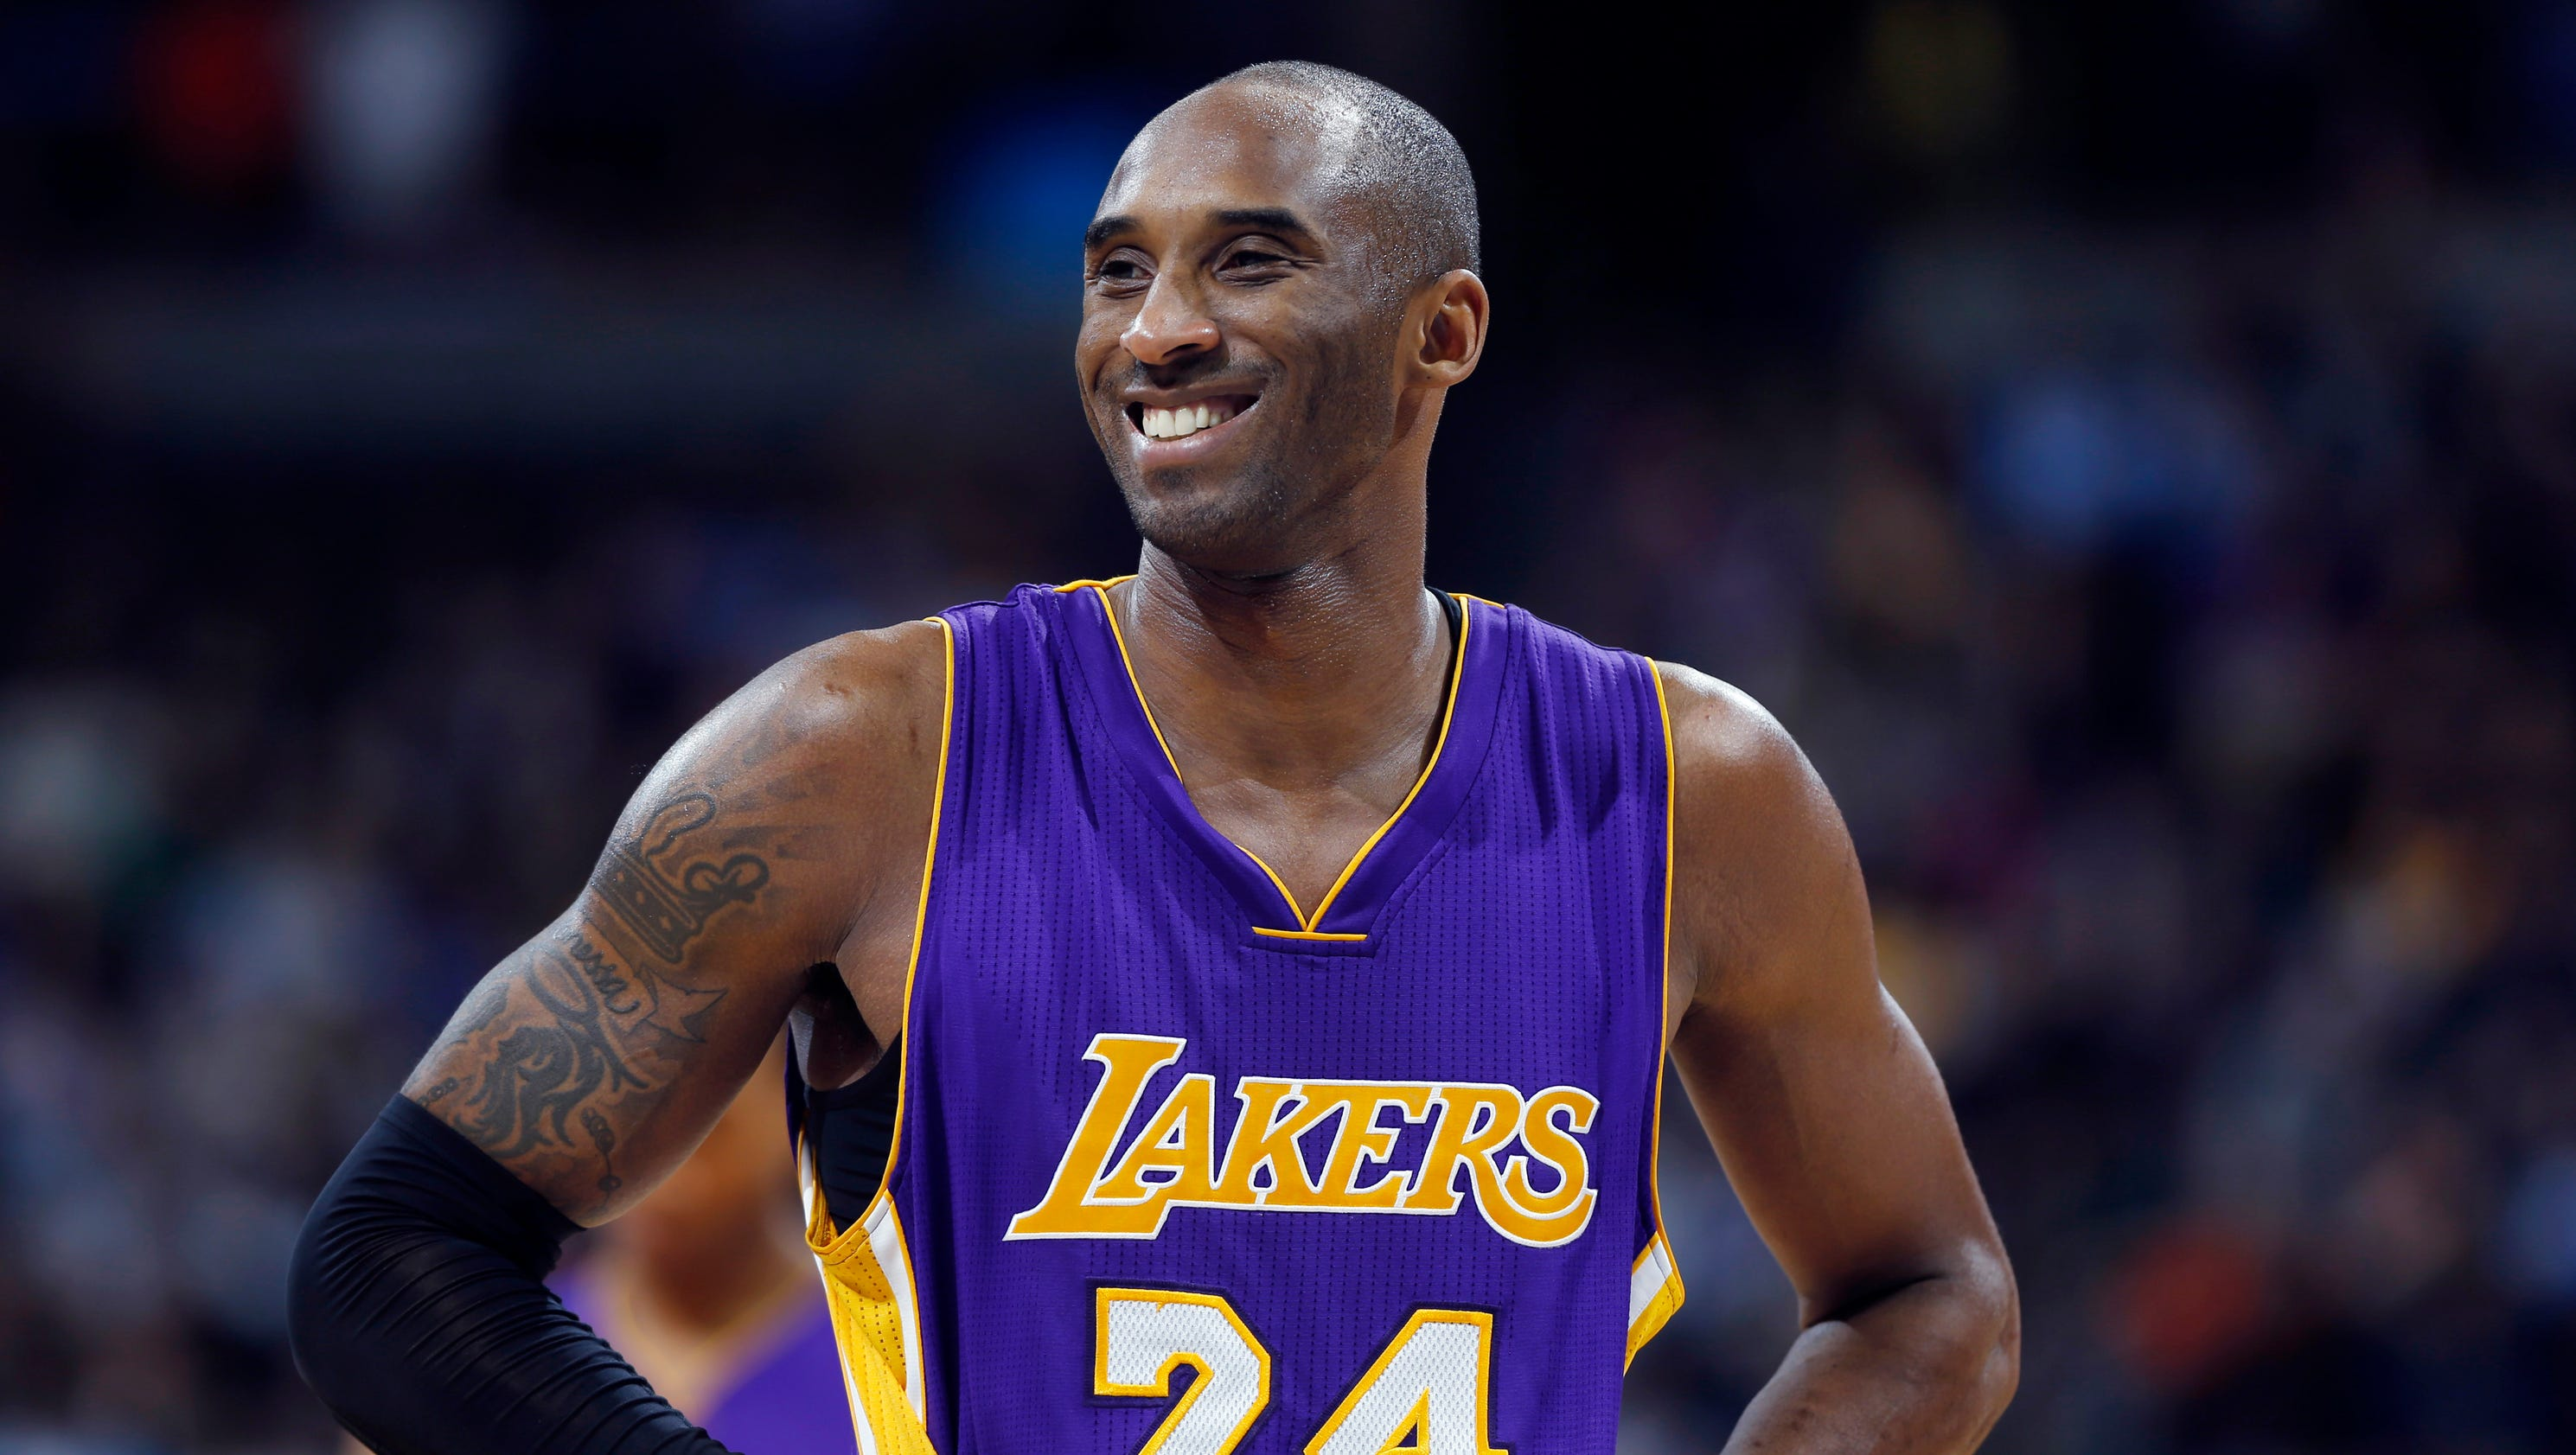 Kobe Bryant will be on floor for Lakers preseason opener